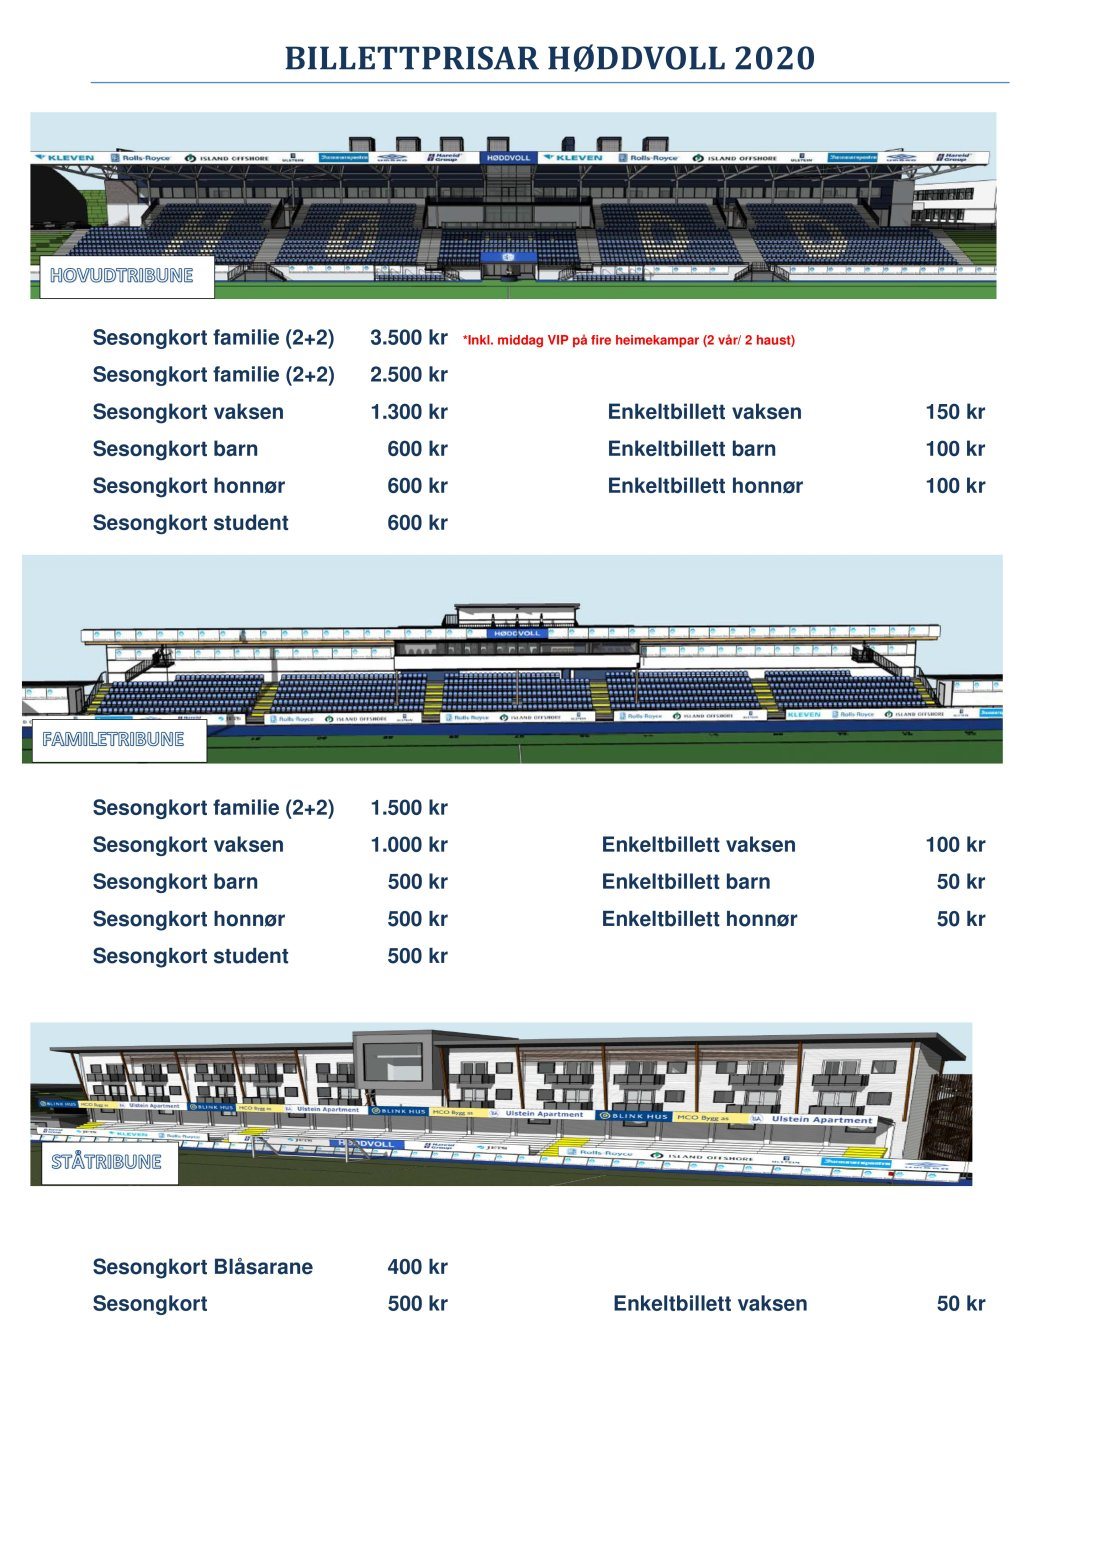 BILLETTPRISAR HØDDVOLL 2020 - A3-page-0